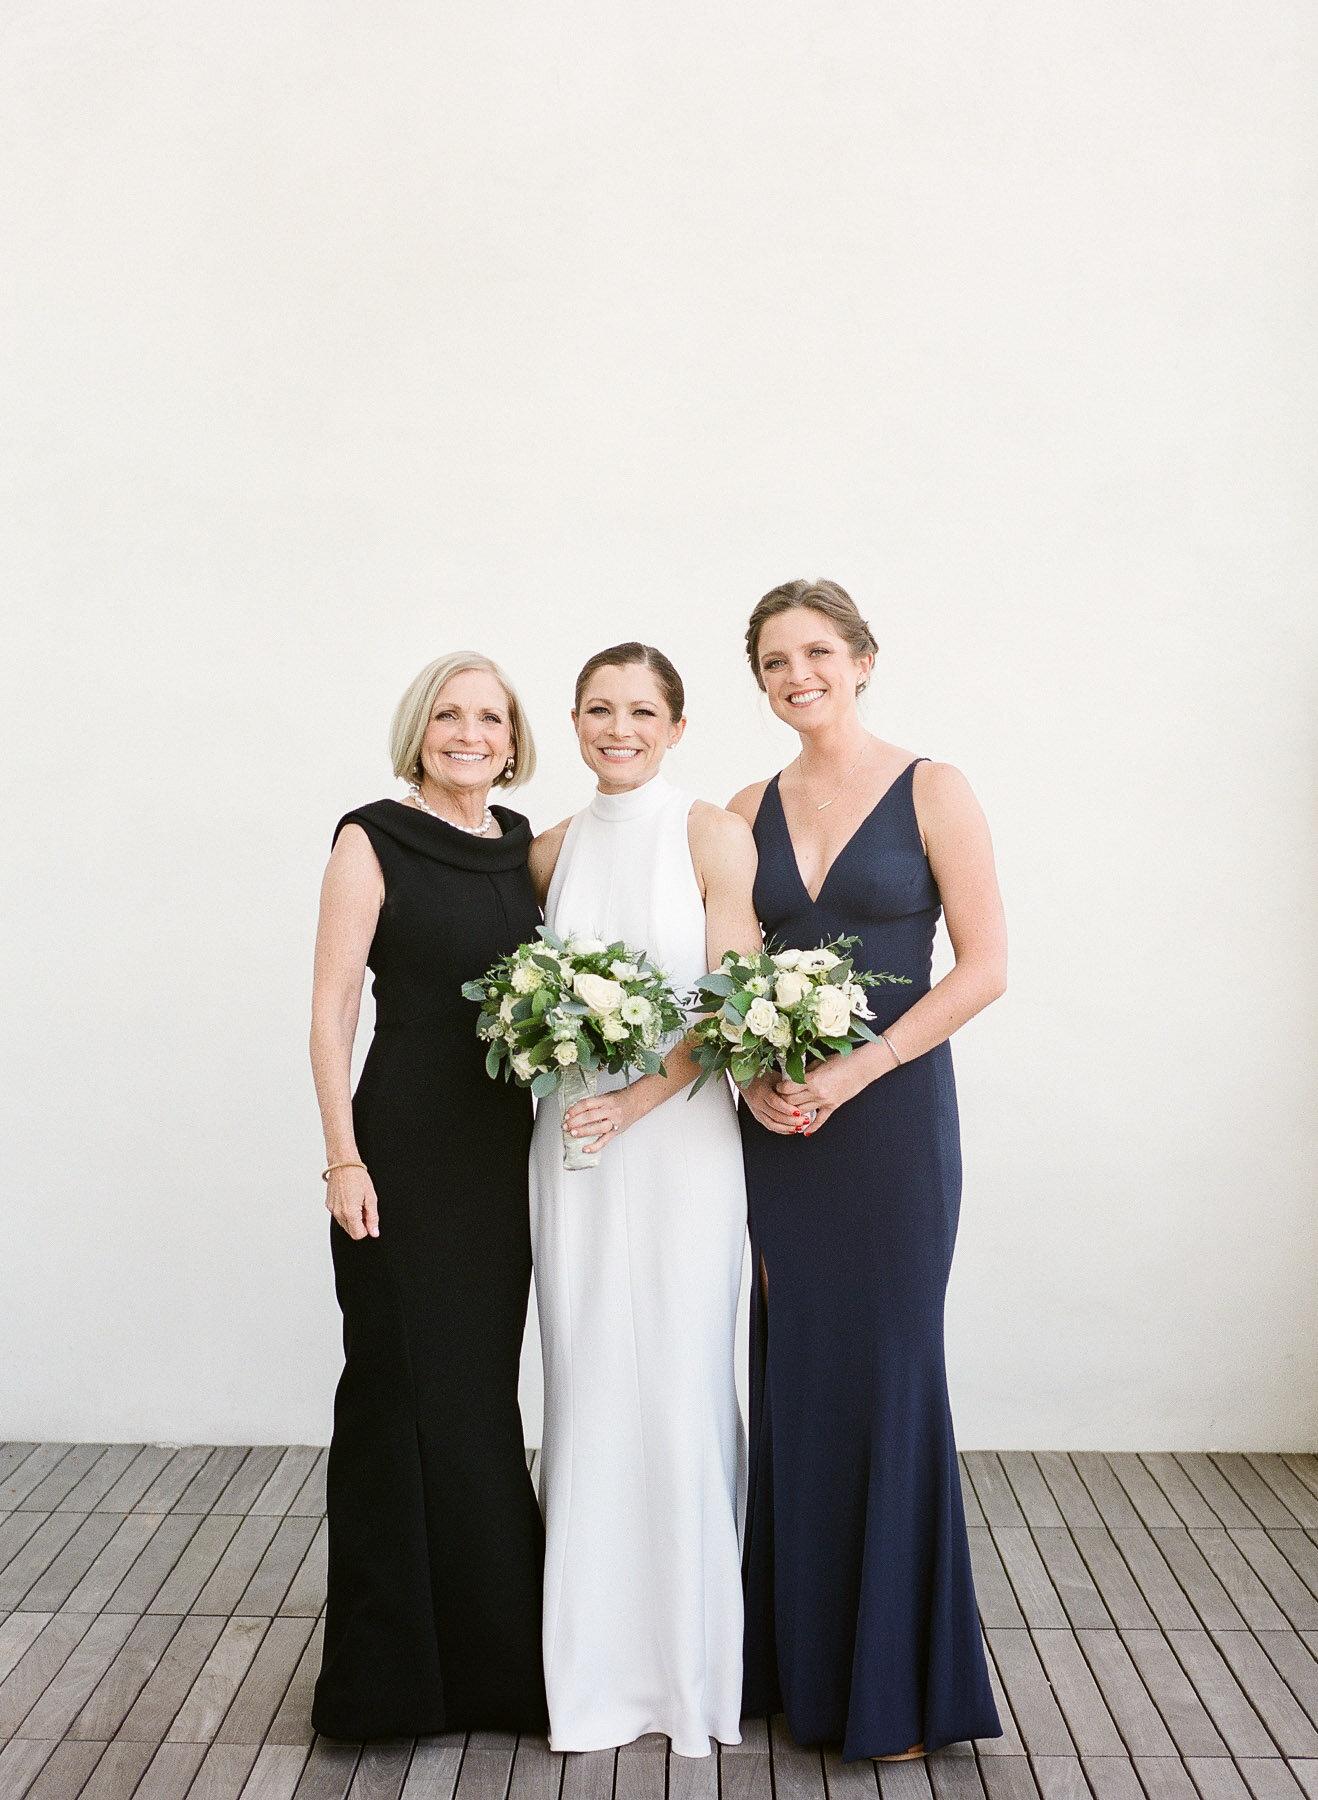 Adelphi Saratoga Wedding by Michelle Lange Photography-65.jpg